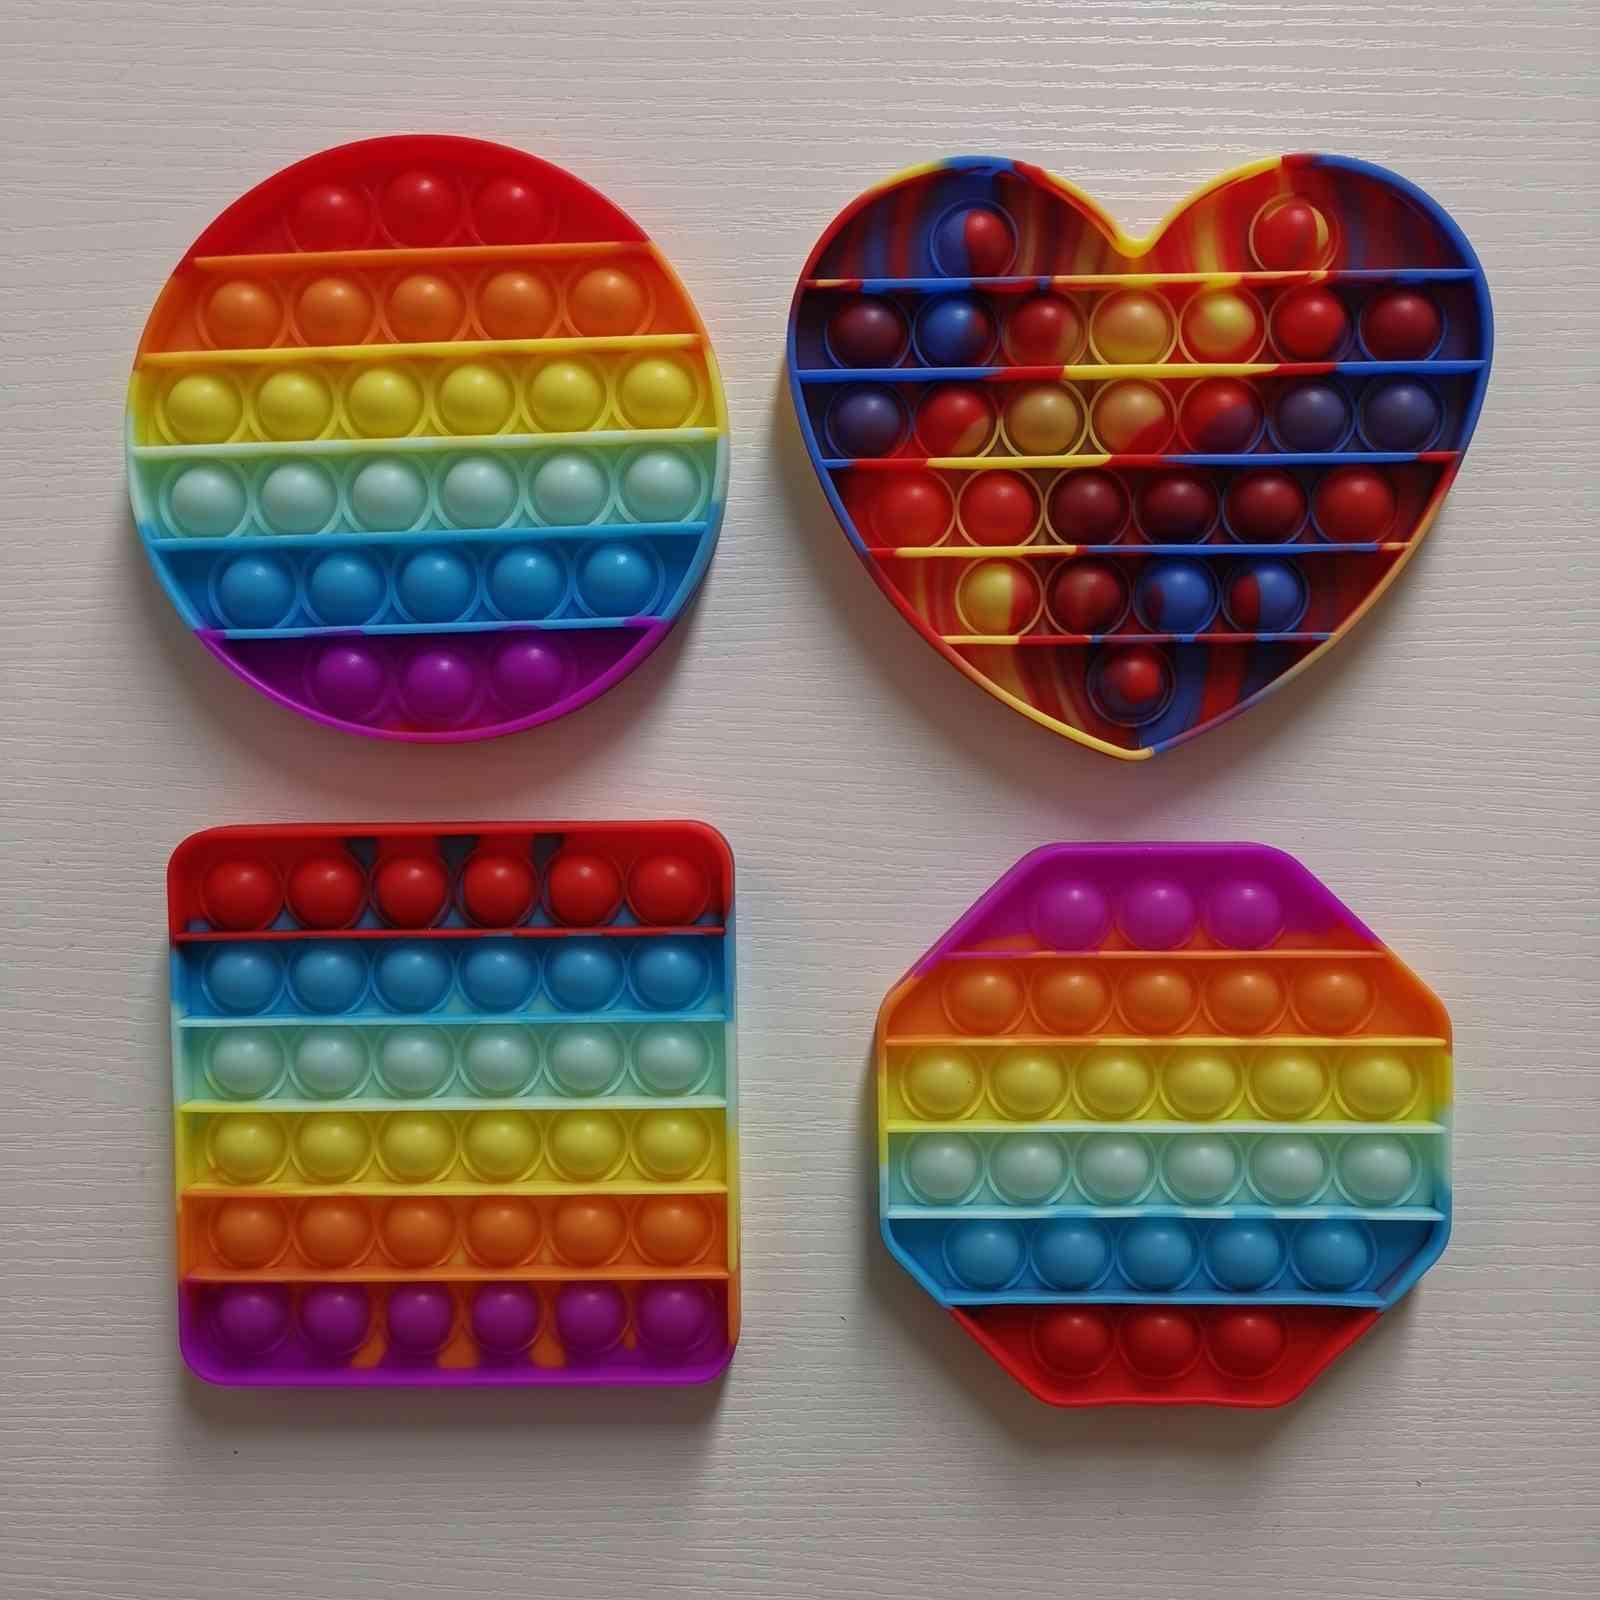 Sensory Fidget Bubble Toy Push Finger Fun Game Squeeze Balls Puzzle Rainbow Camo Stress Relief ADHD Heart Circle Square Shape G31604